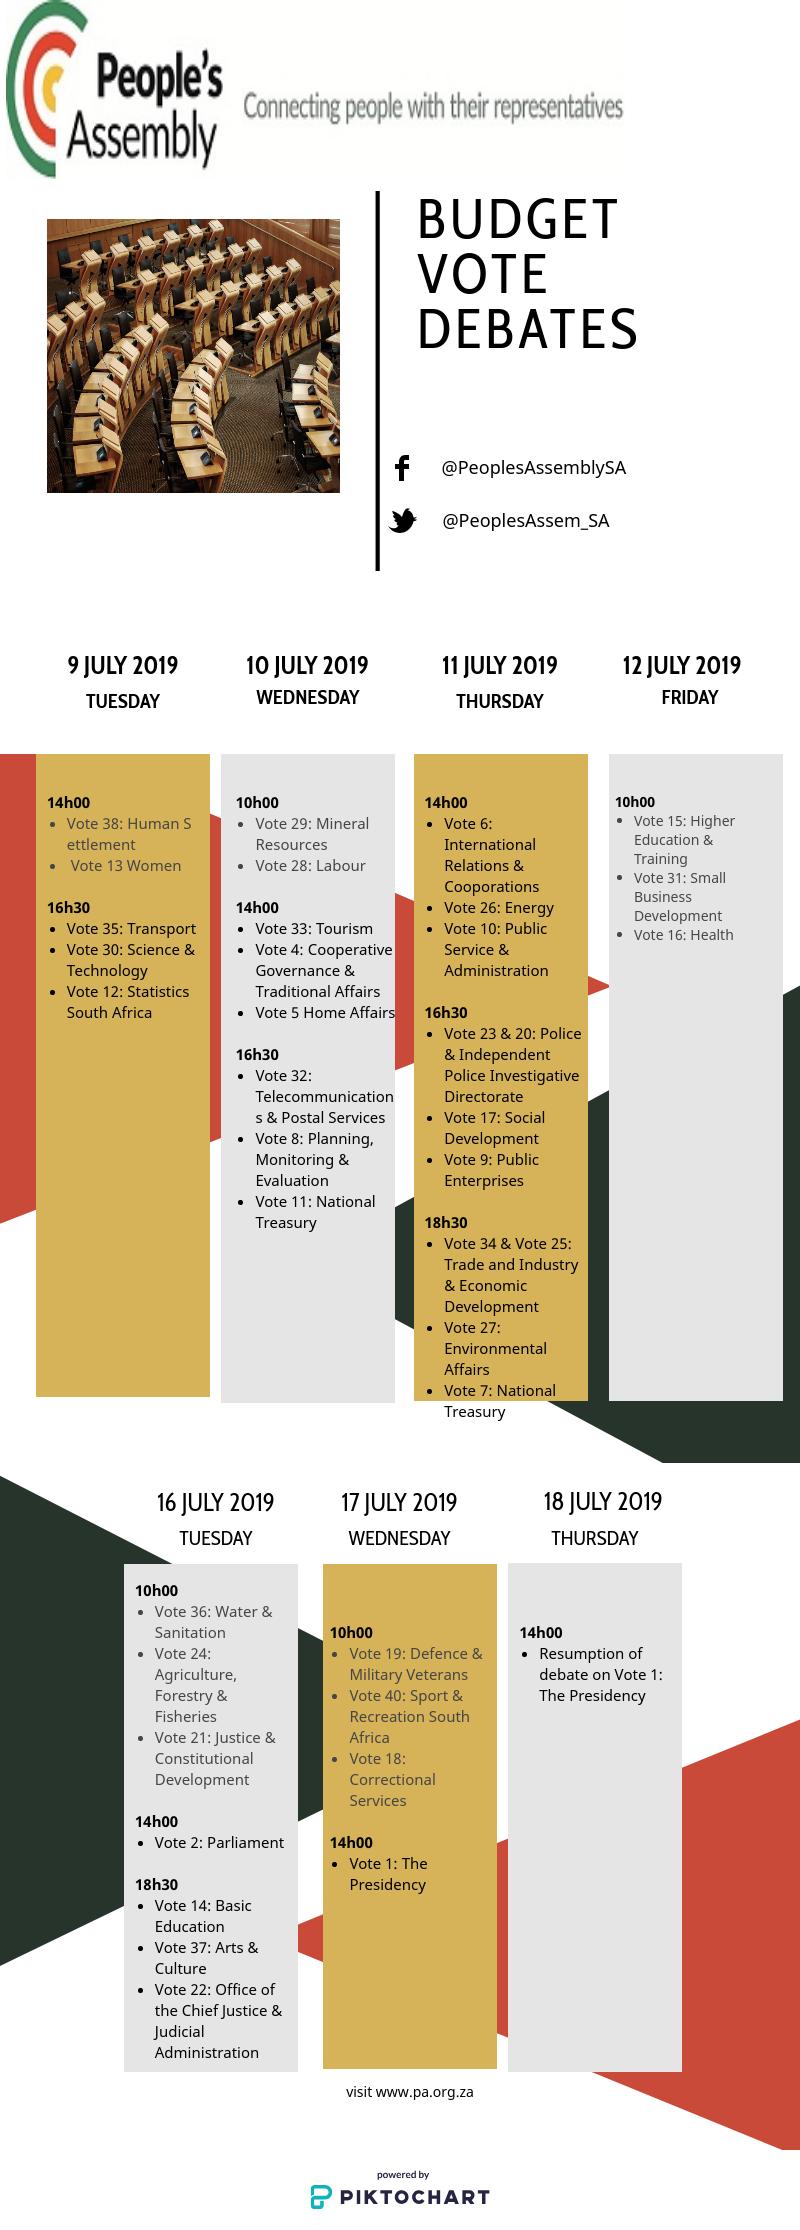 2019budgetdebatevotes